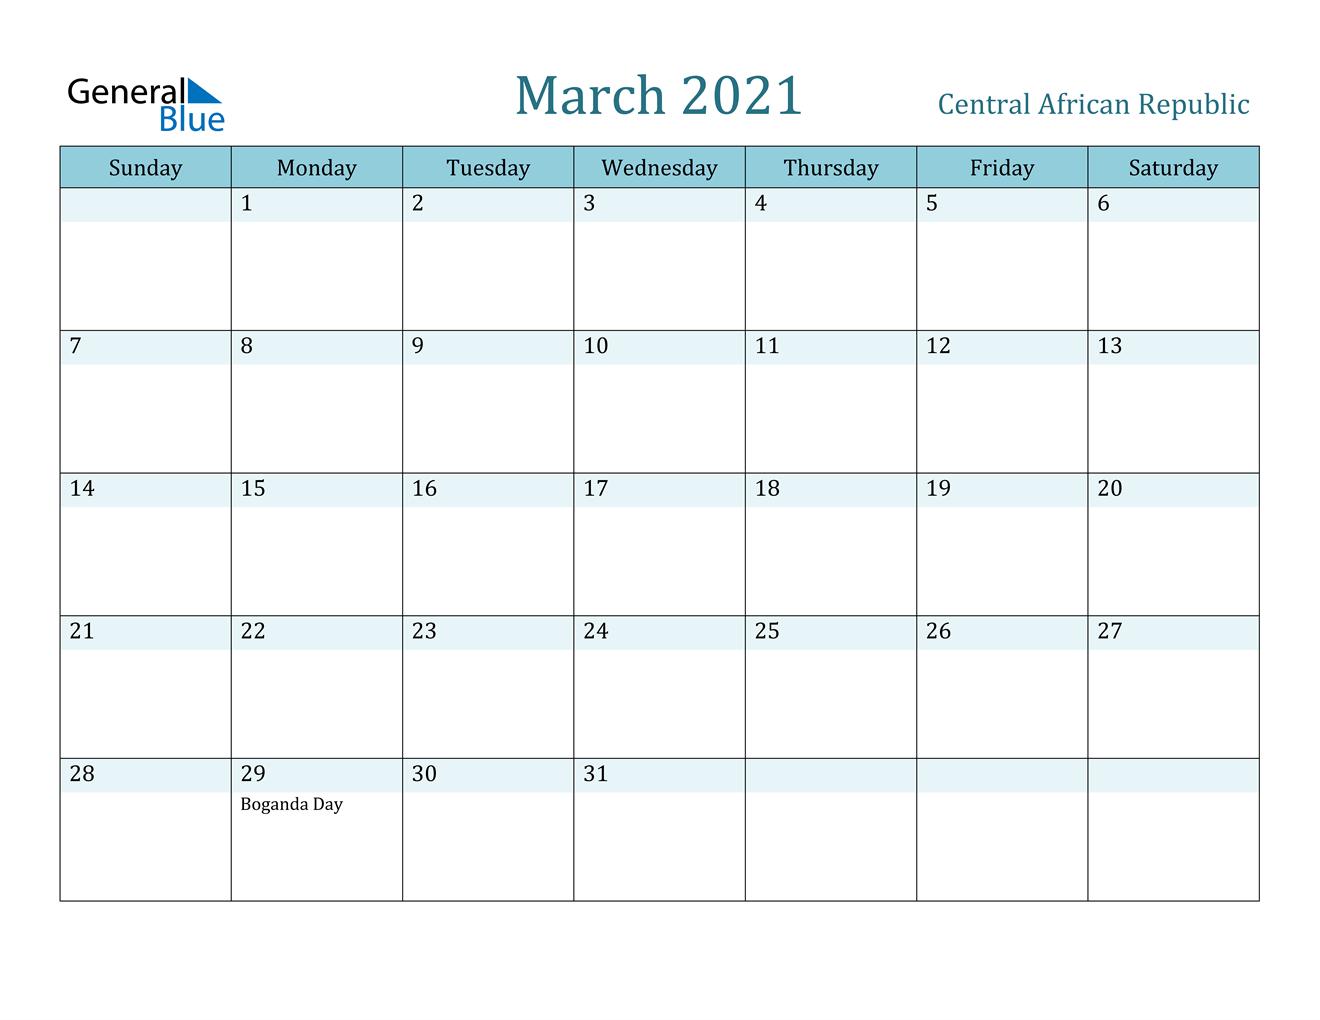 March 2021 Calendar Central African Republic 2